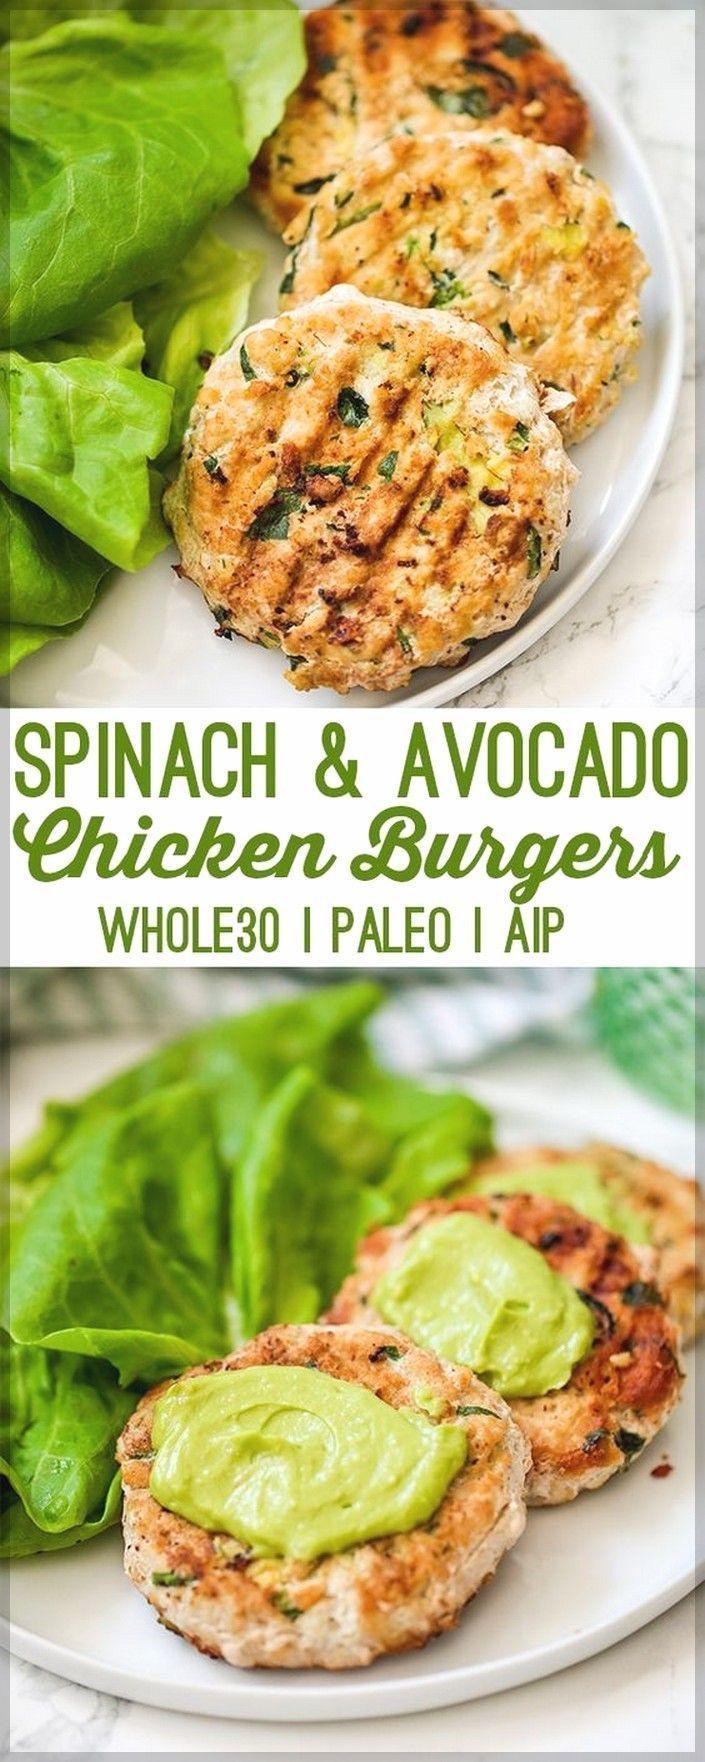 Spinat Avocado Chicken Burgers   Gesunde Avocado-Rezepte – Essen & Trinken – G ….